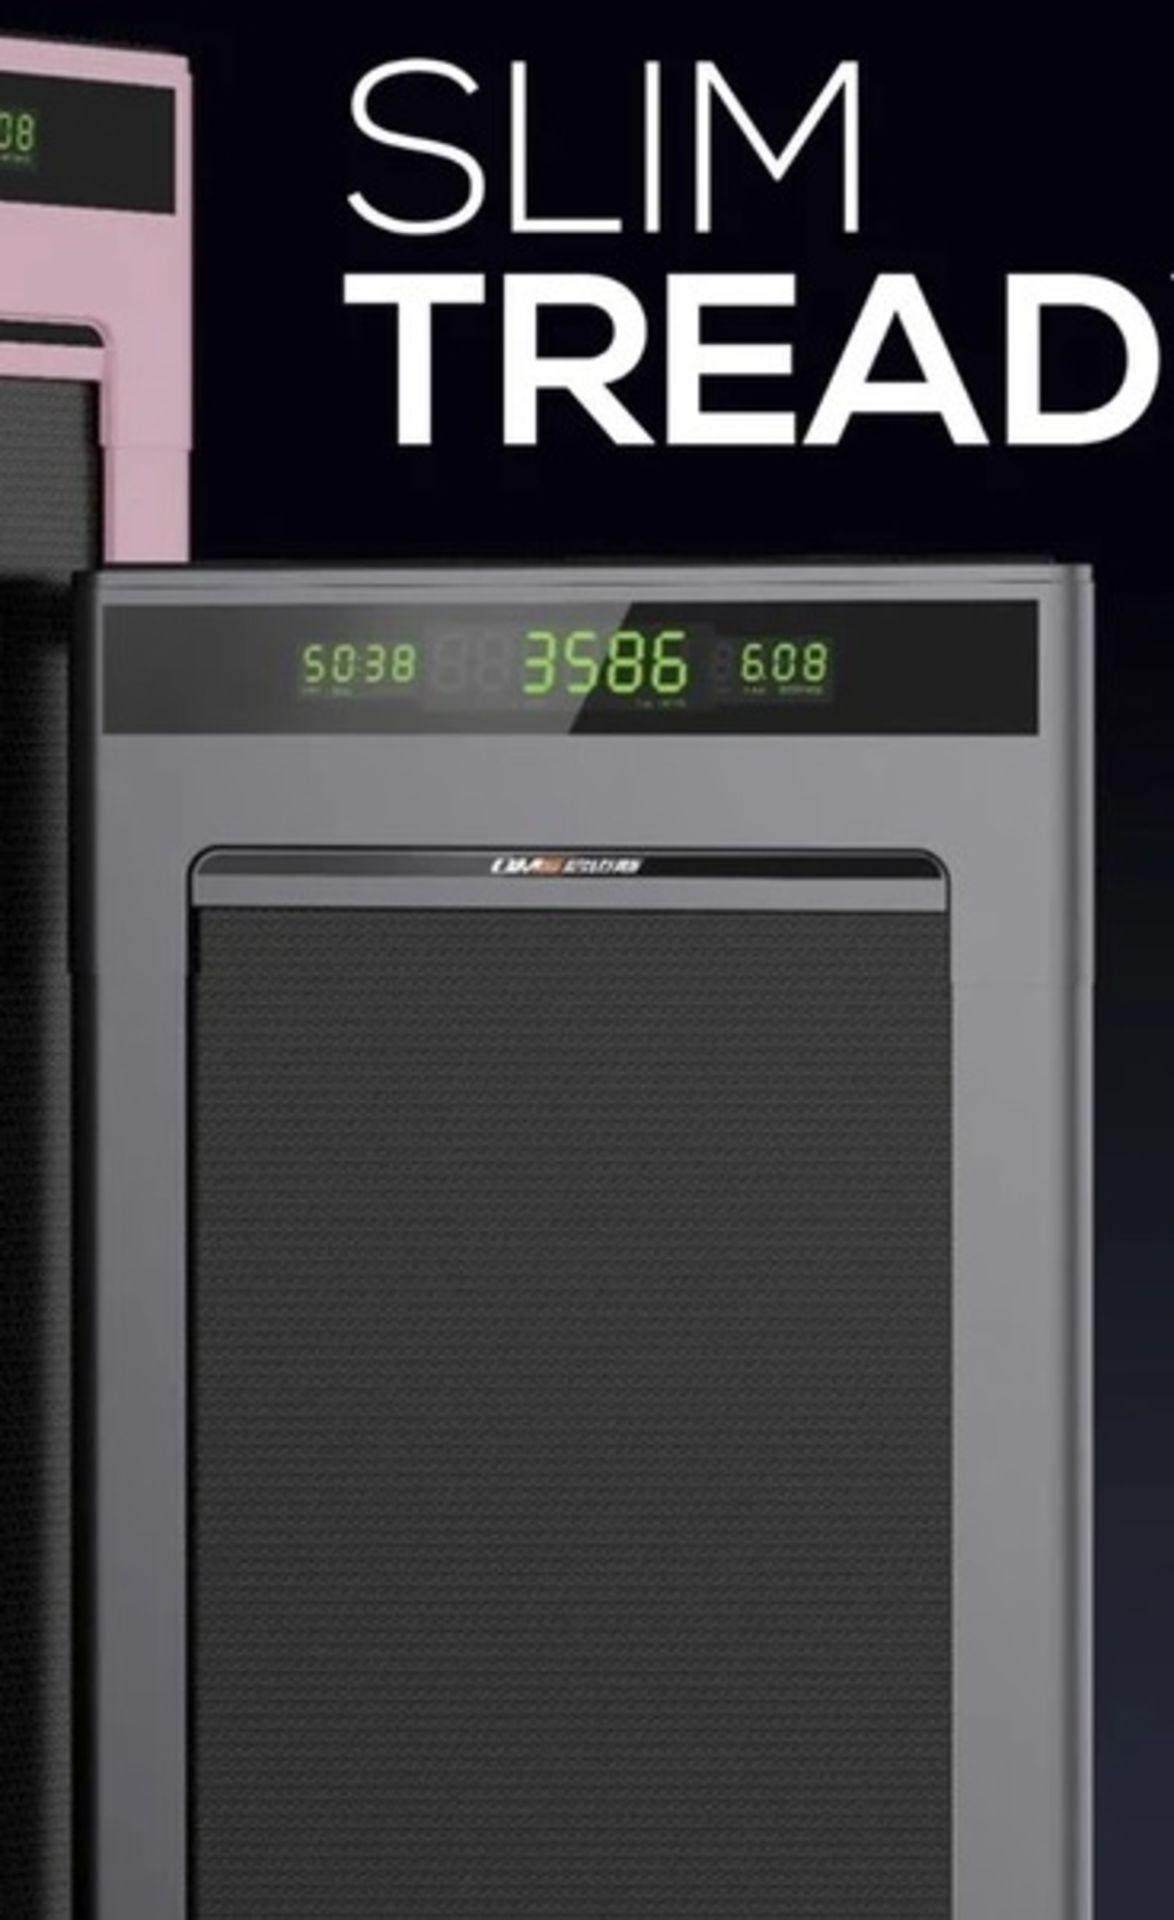 1 x Slim Tread Ultra Thin Smart Treadmill Running / Walking Machine - Lightweight With Folding - Image 17 of 19